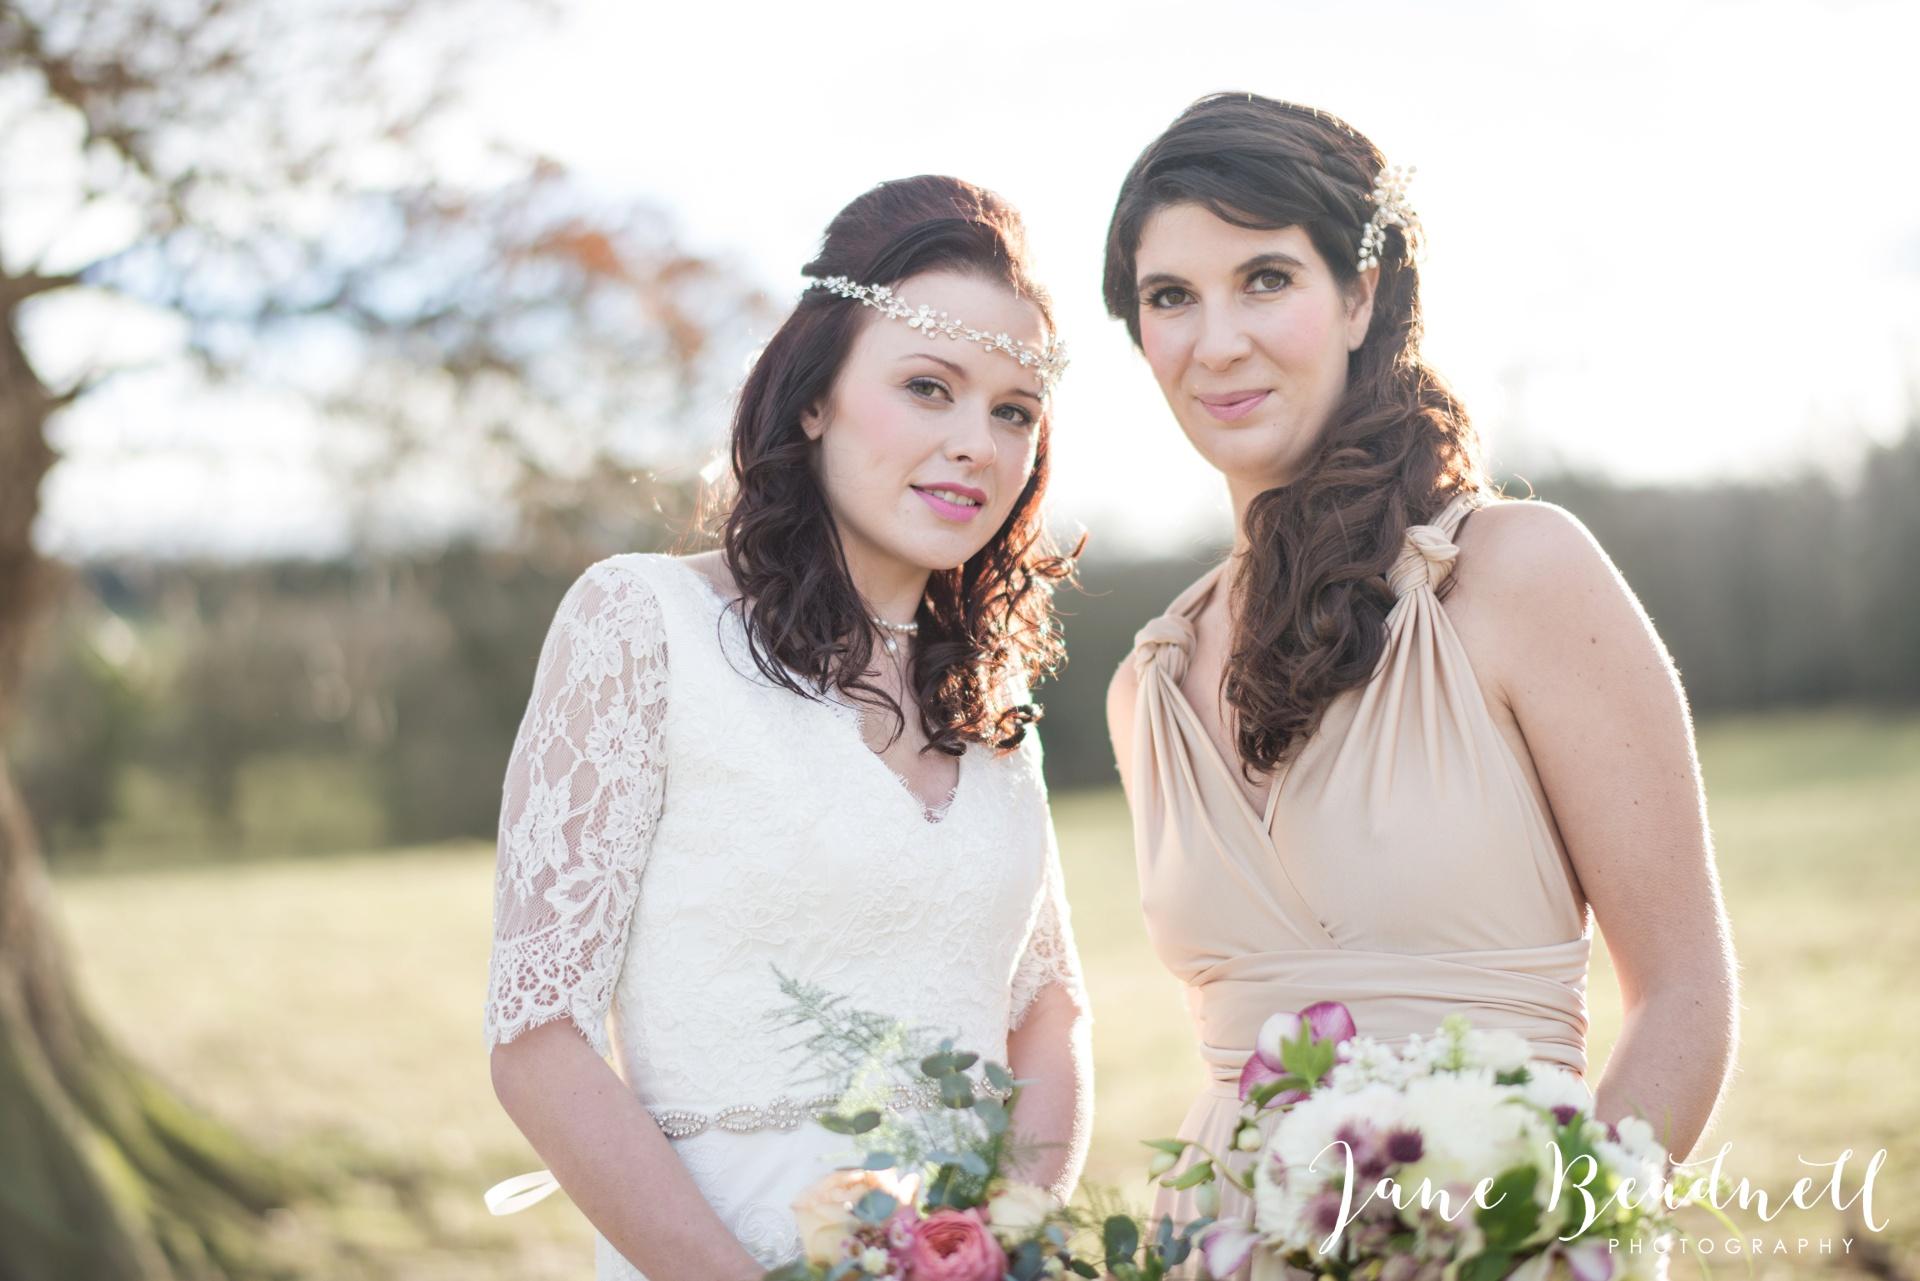 Jane Beadnell fine art wedding photographer Swinton Park14